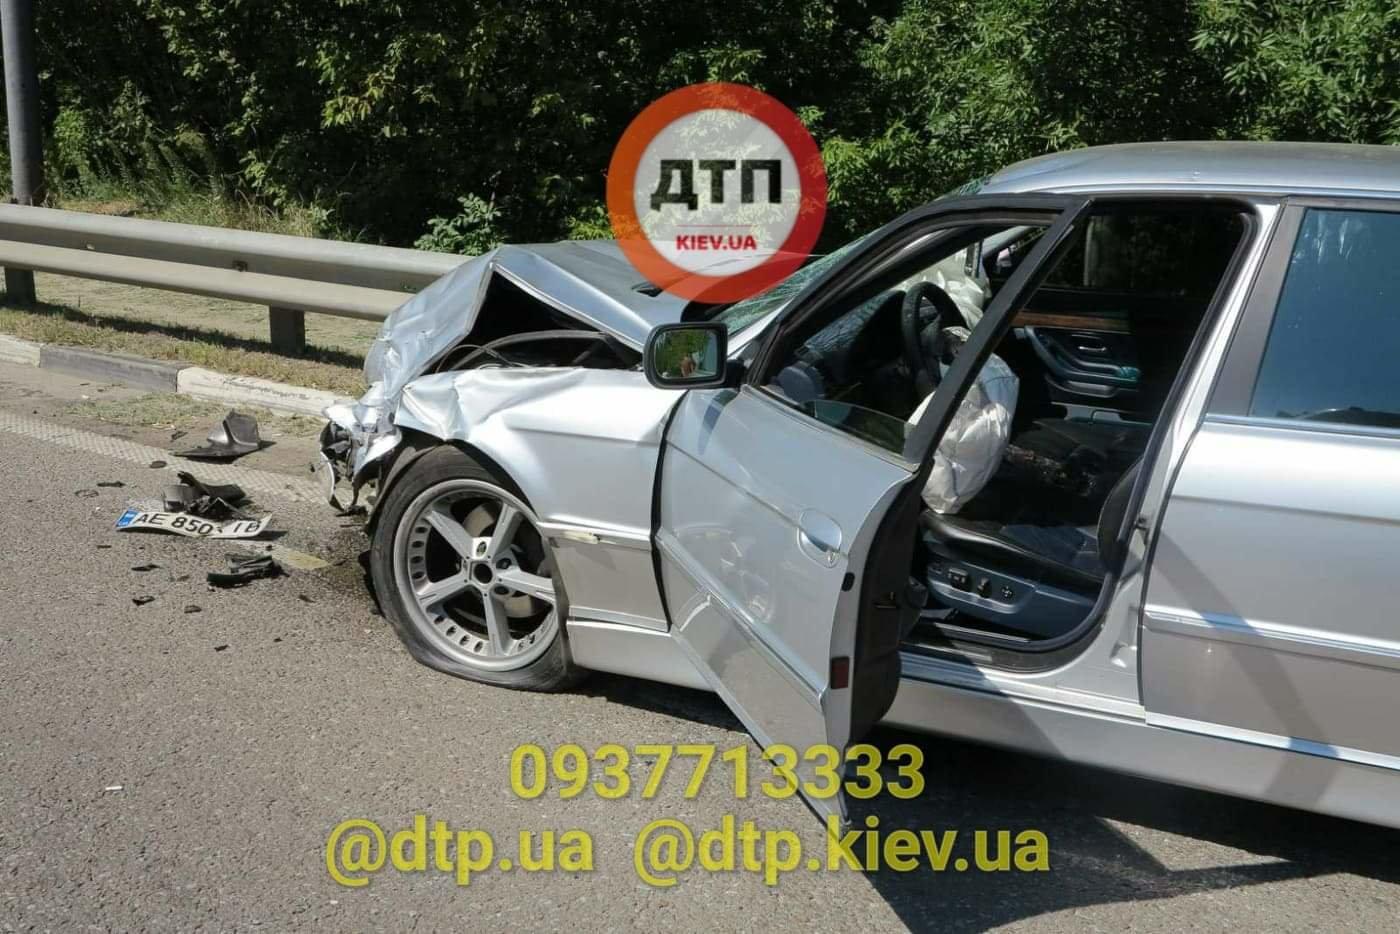 В Киеве произошло серьезное ДТП: легковушка сбила мотоциклиста - ФОТО, фото-1